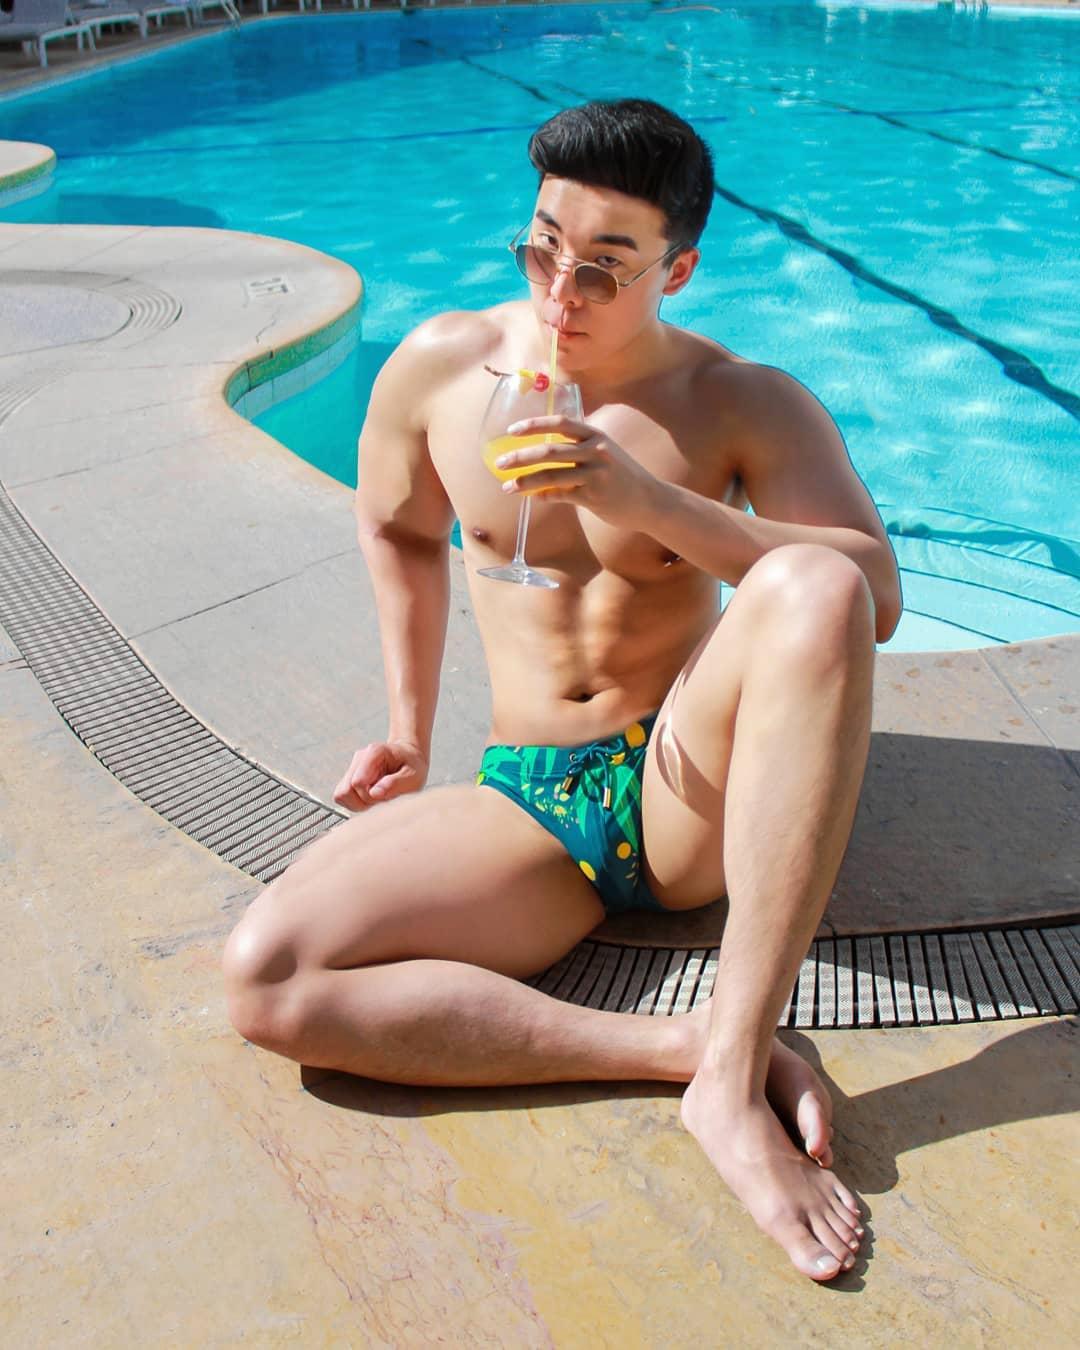 jonokwan hot australian man gay travel